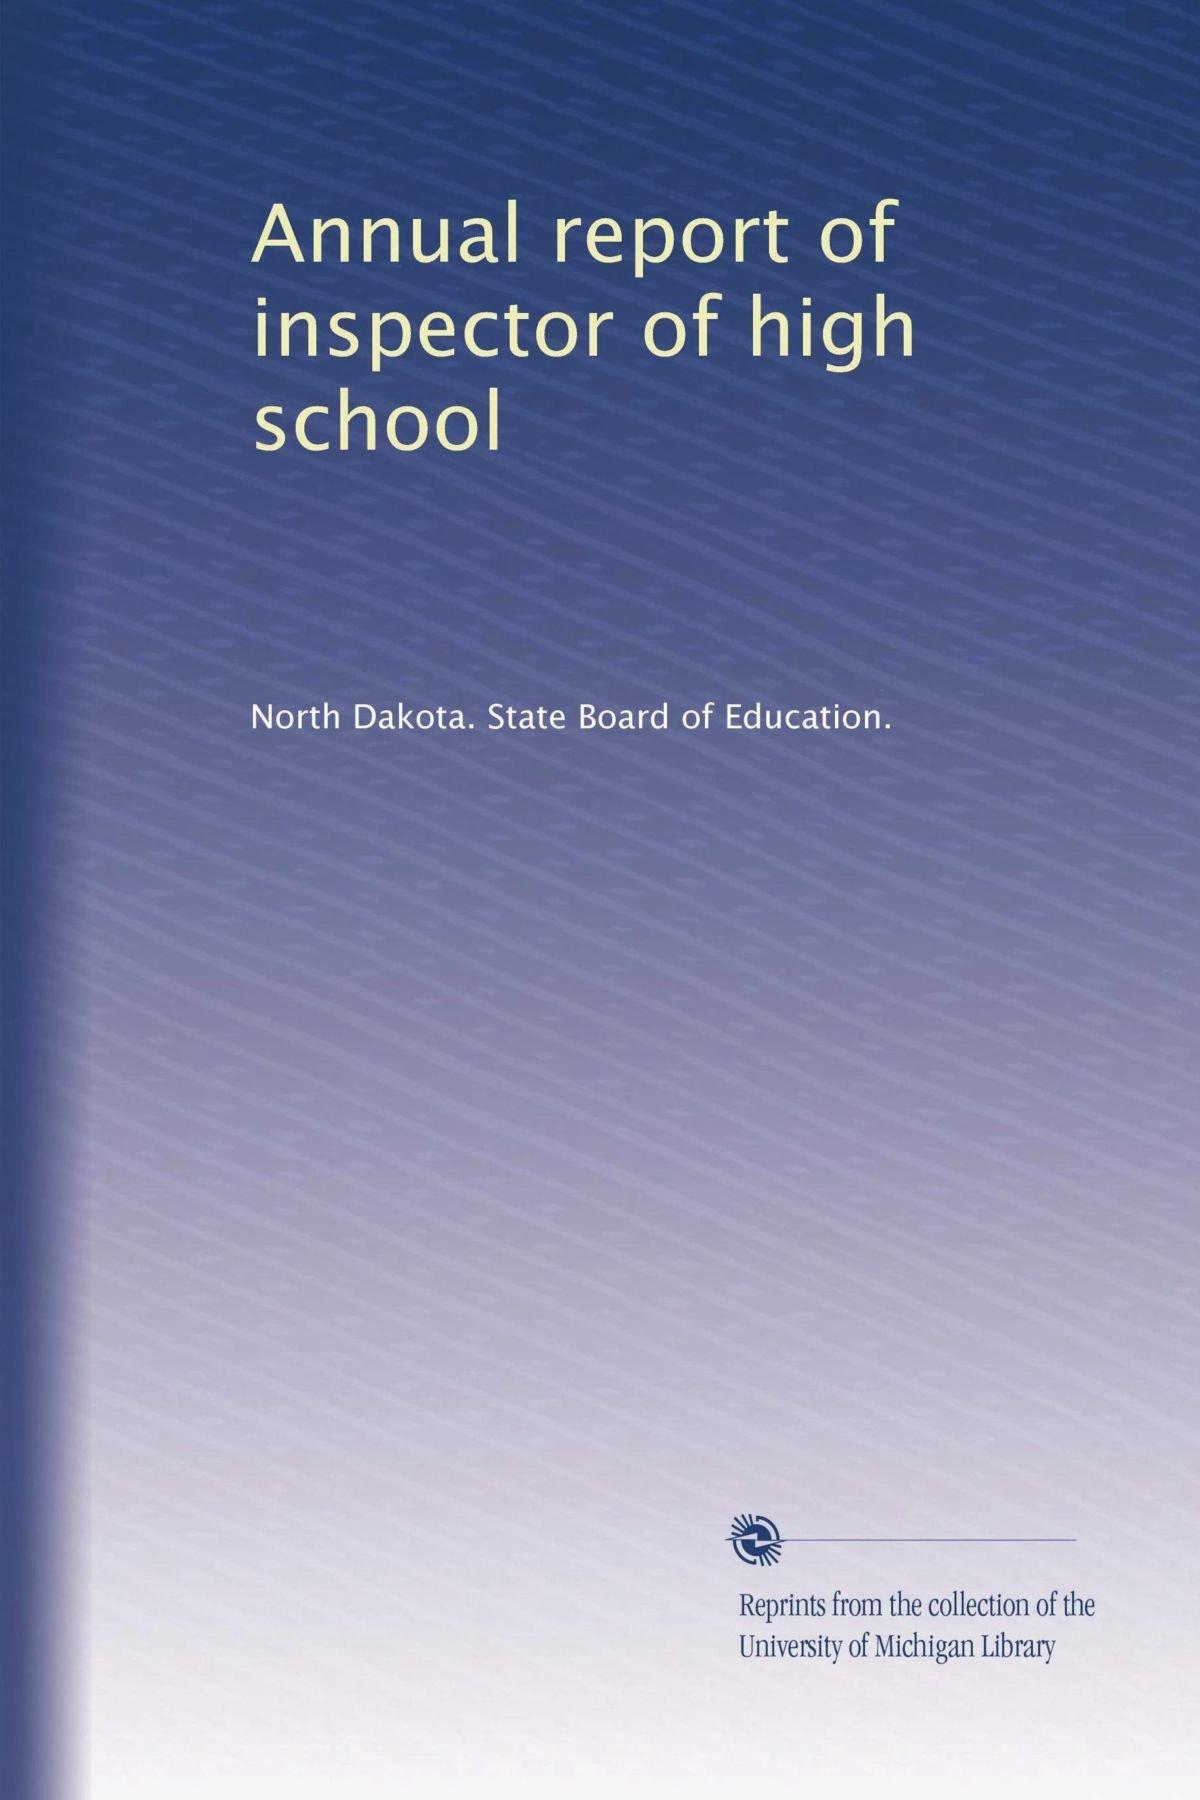 Download Annual report of inspector of high school ebook